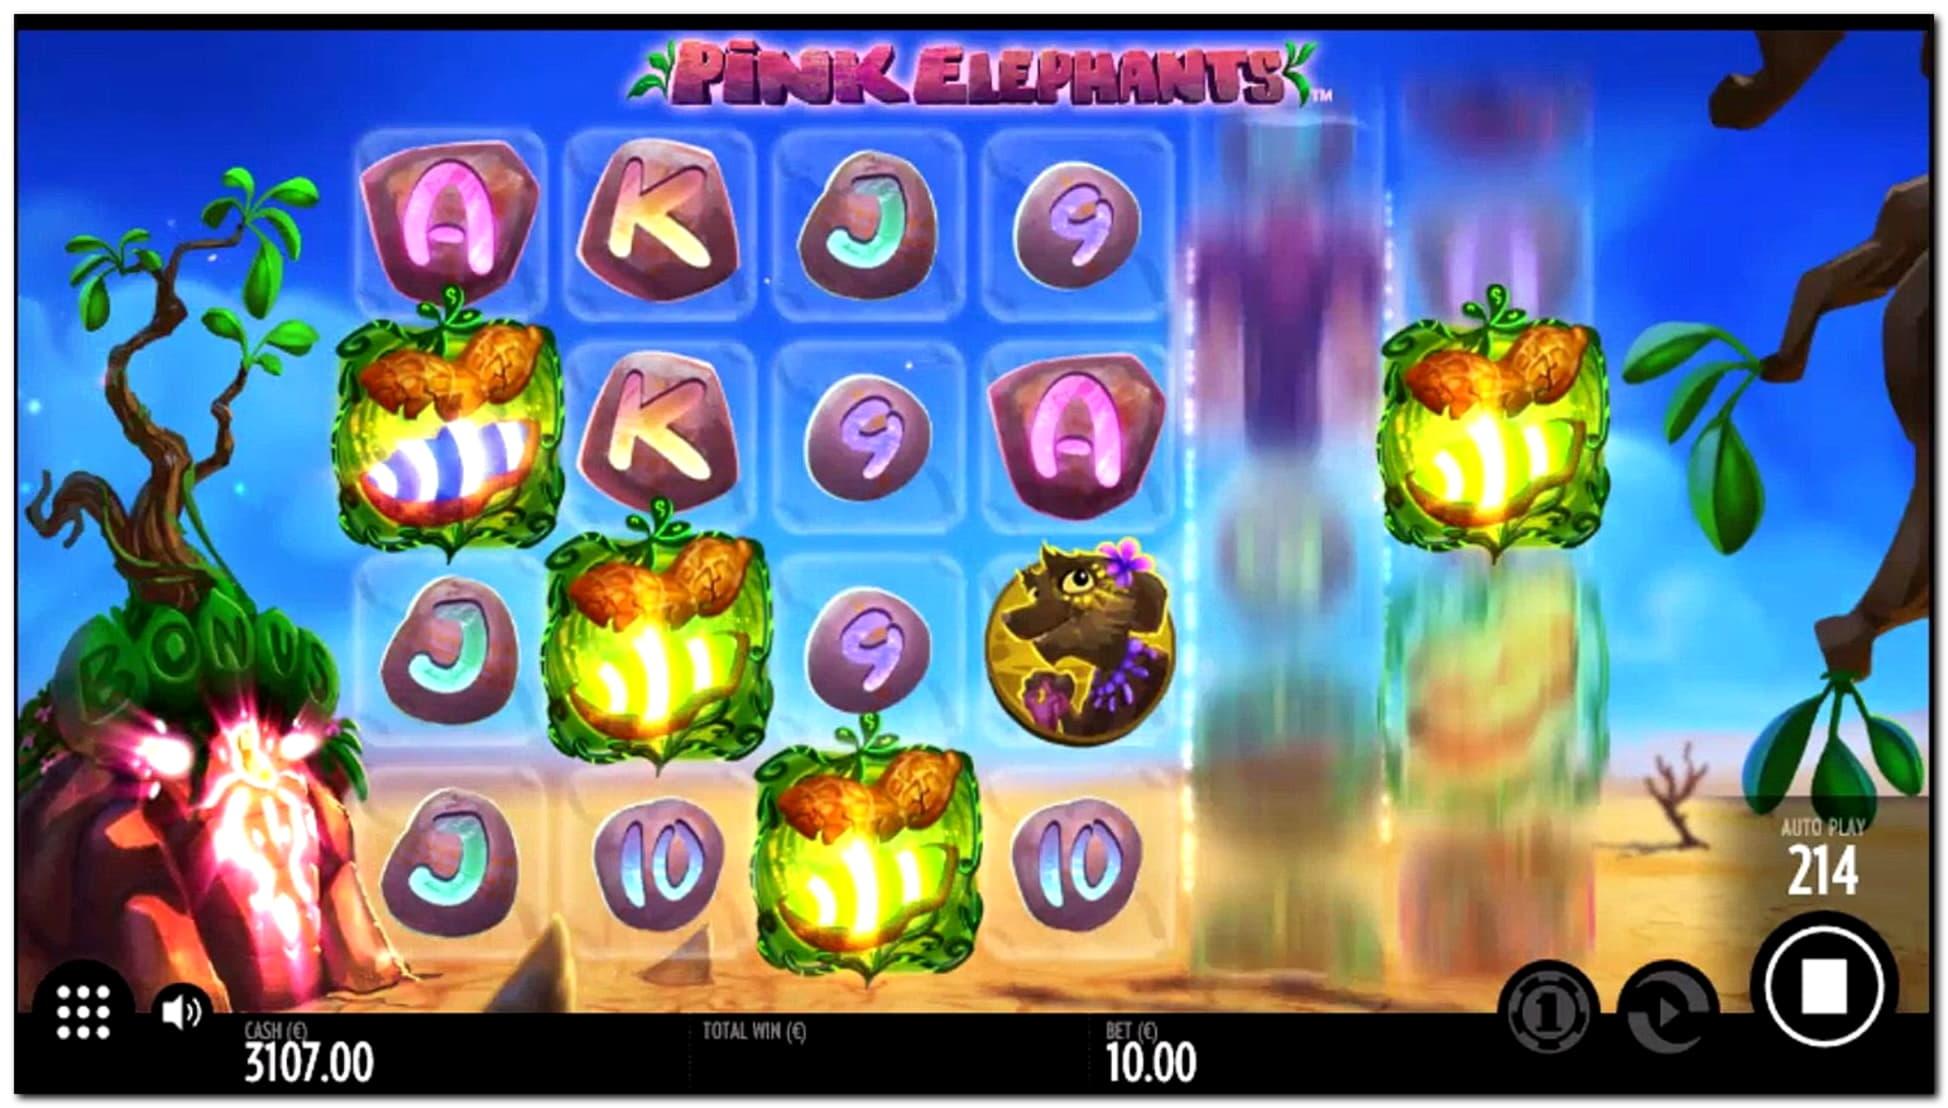 EUR 3315 Geen stortingsbonus bij 7 Sultans Casino